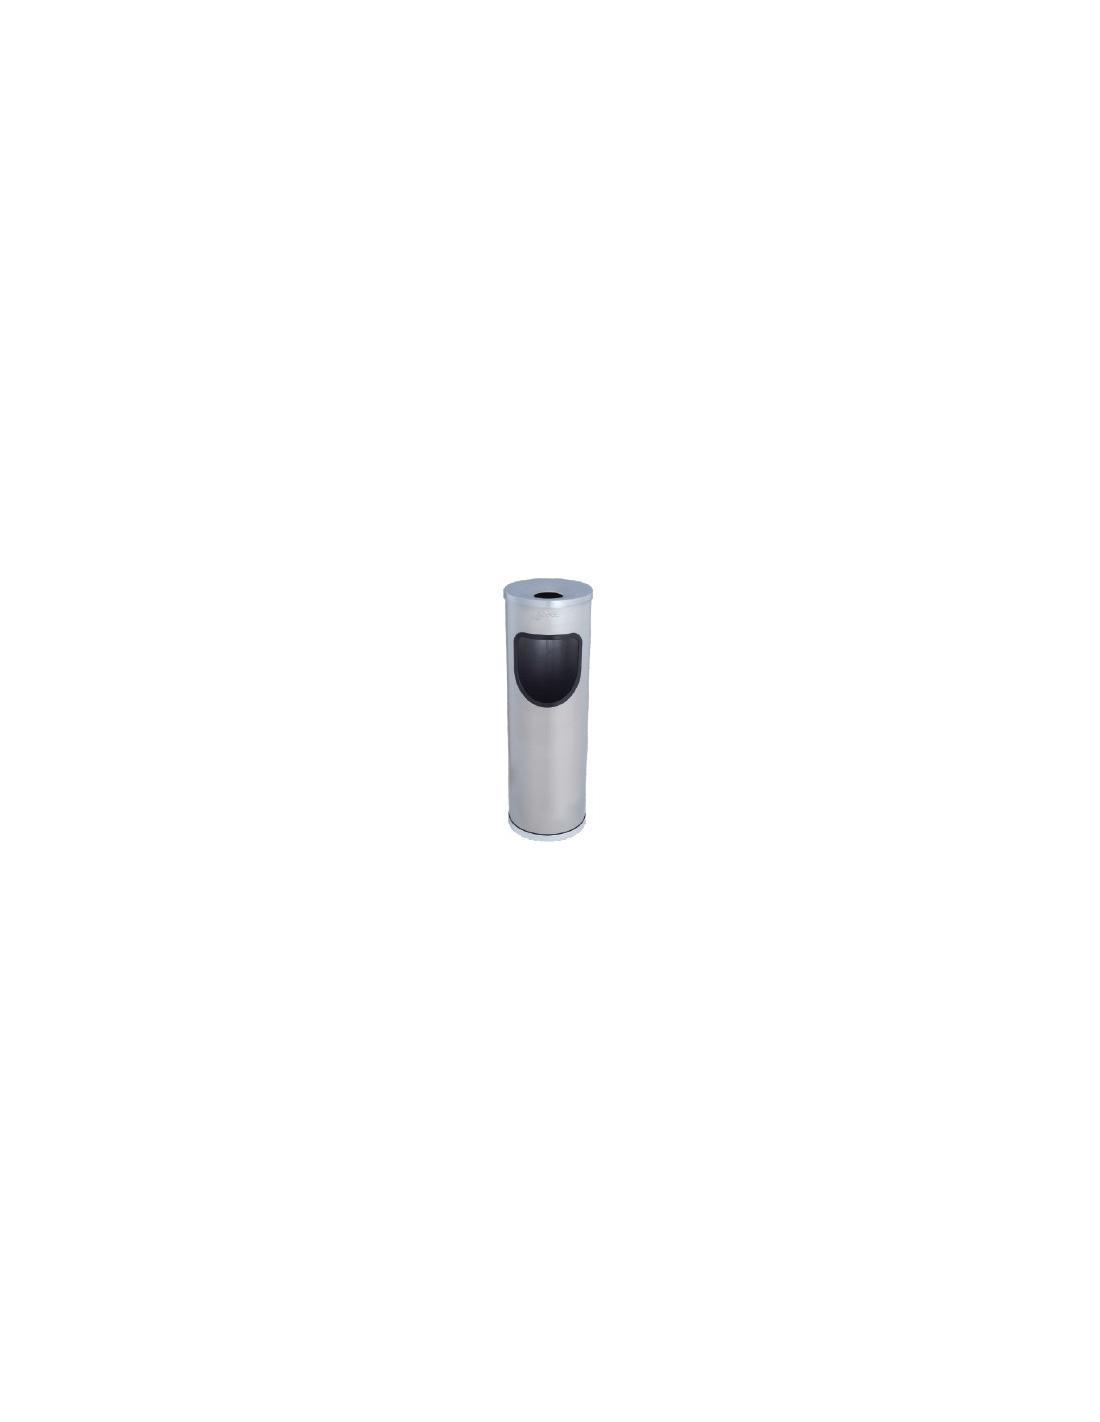 POUBELLE CENDRIER INOX JOFEL - 1